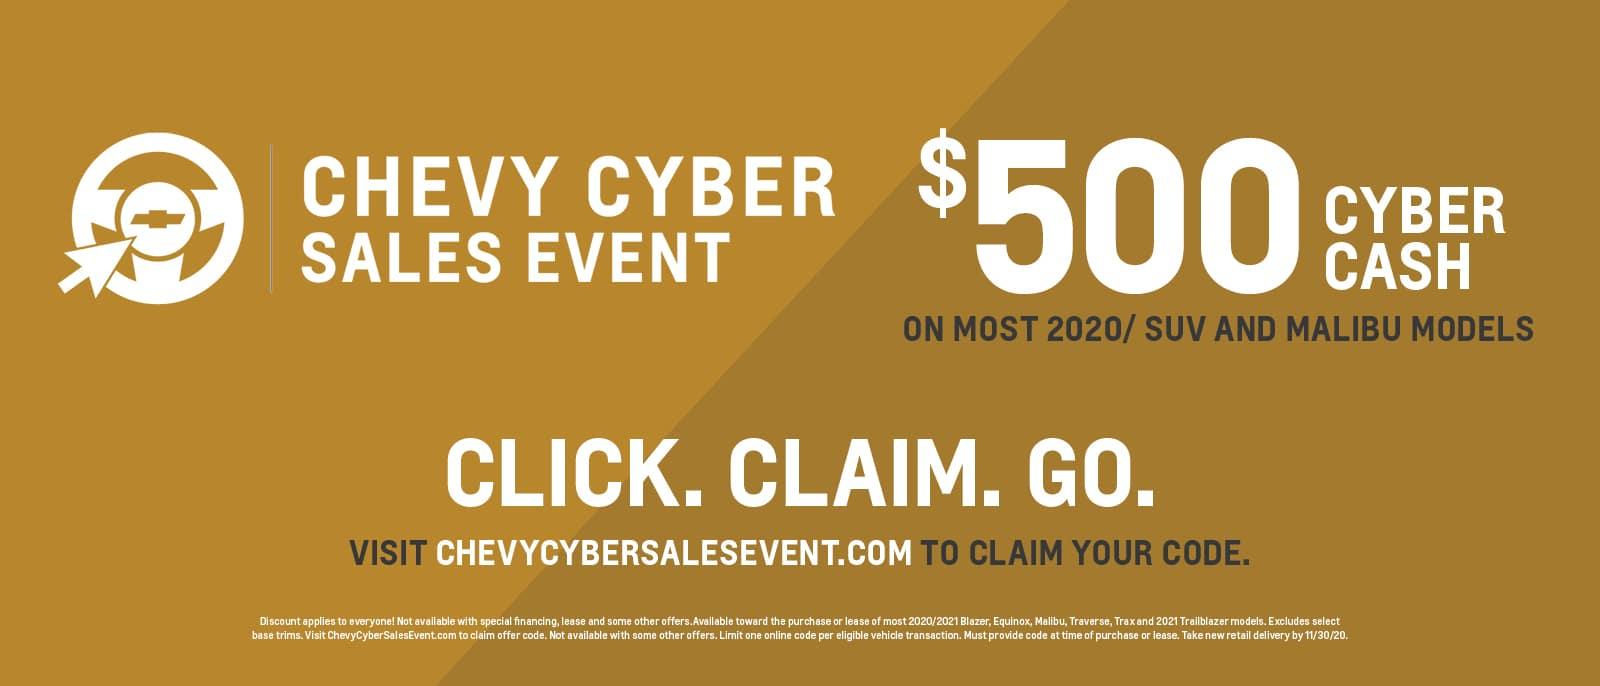 RWCB-59064_CyberCash-Homepage